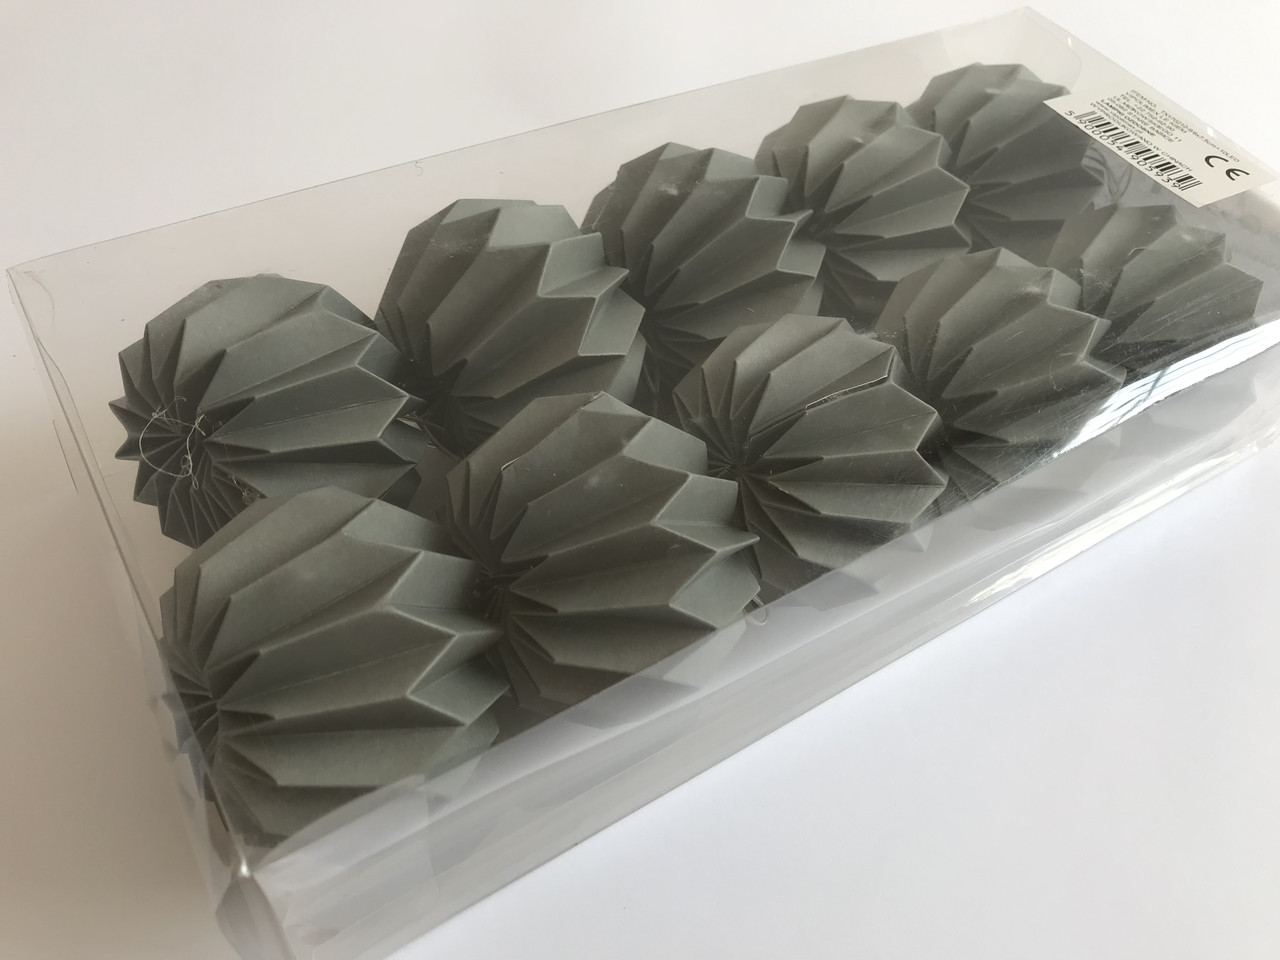 Гирлянда Decorino Dark Paper Balls 10led, диам 7.5см, длина 235см на батарейках АА